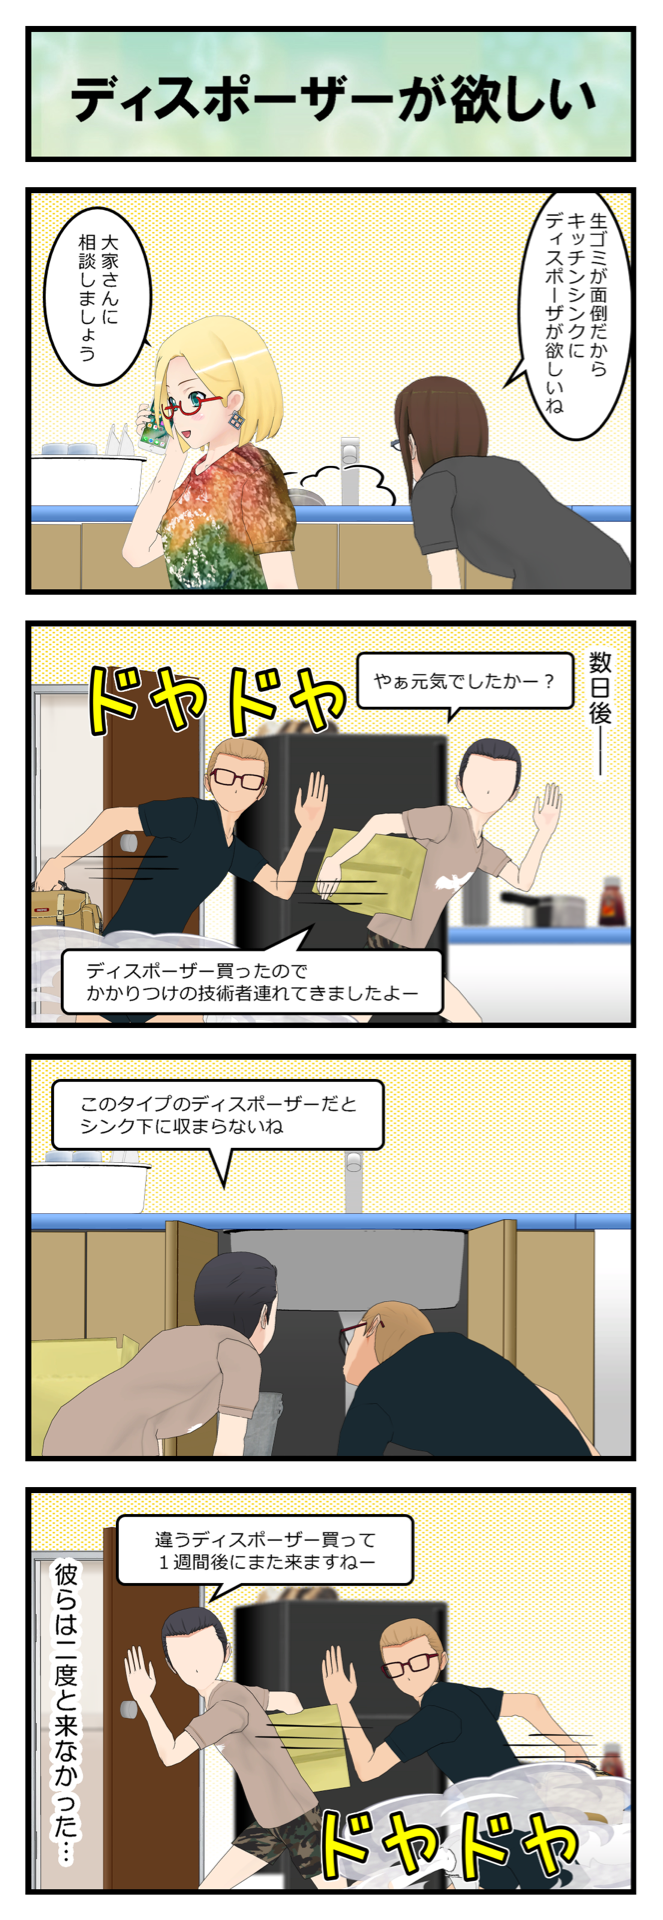 IMG_7568